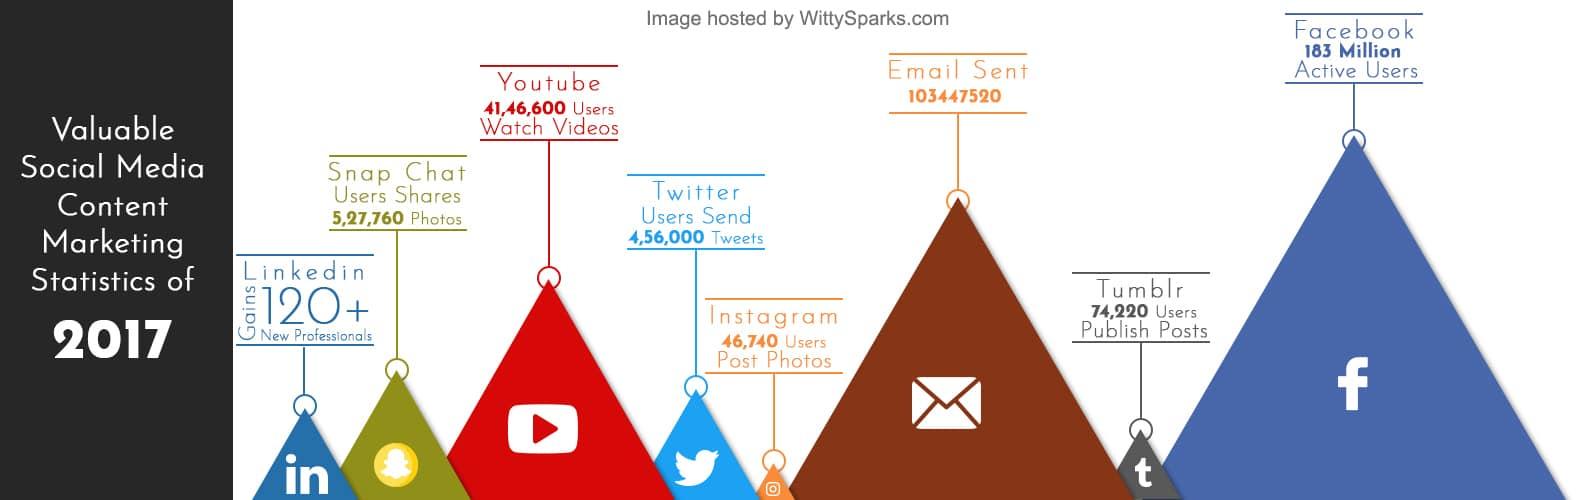 Social Media Content Marketing Stats